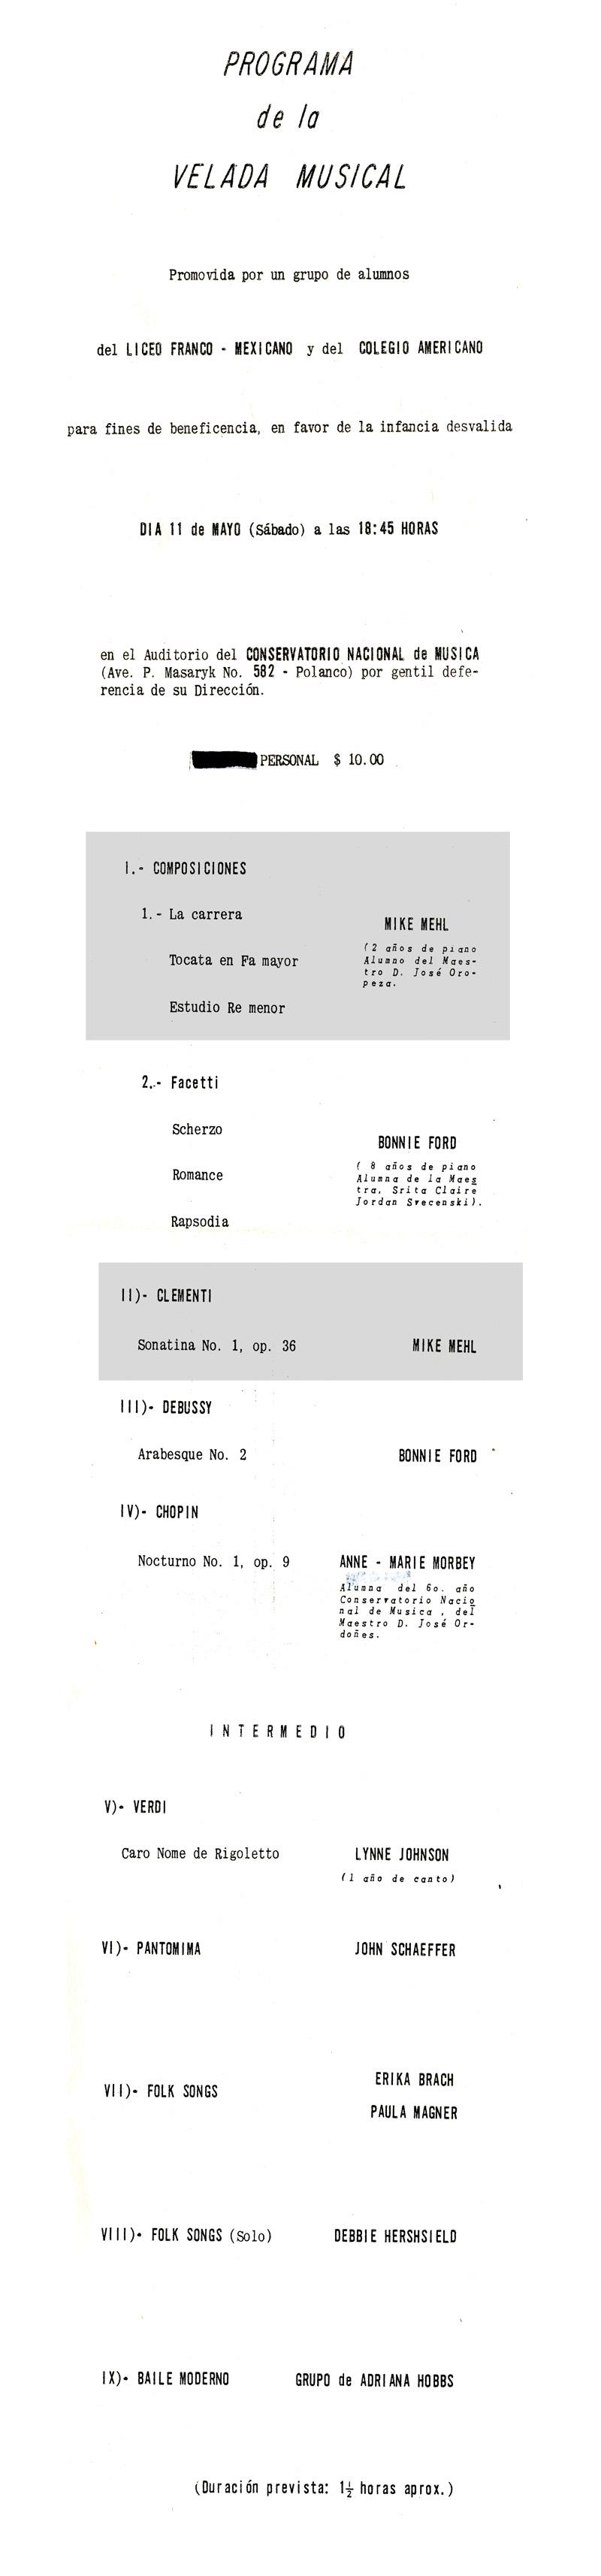 1966_Michael-Mehl-Recital_Conservatorio-Nacional